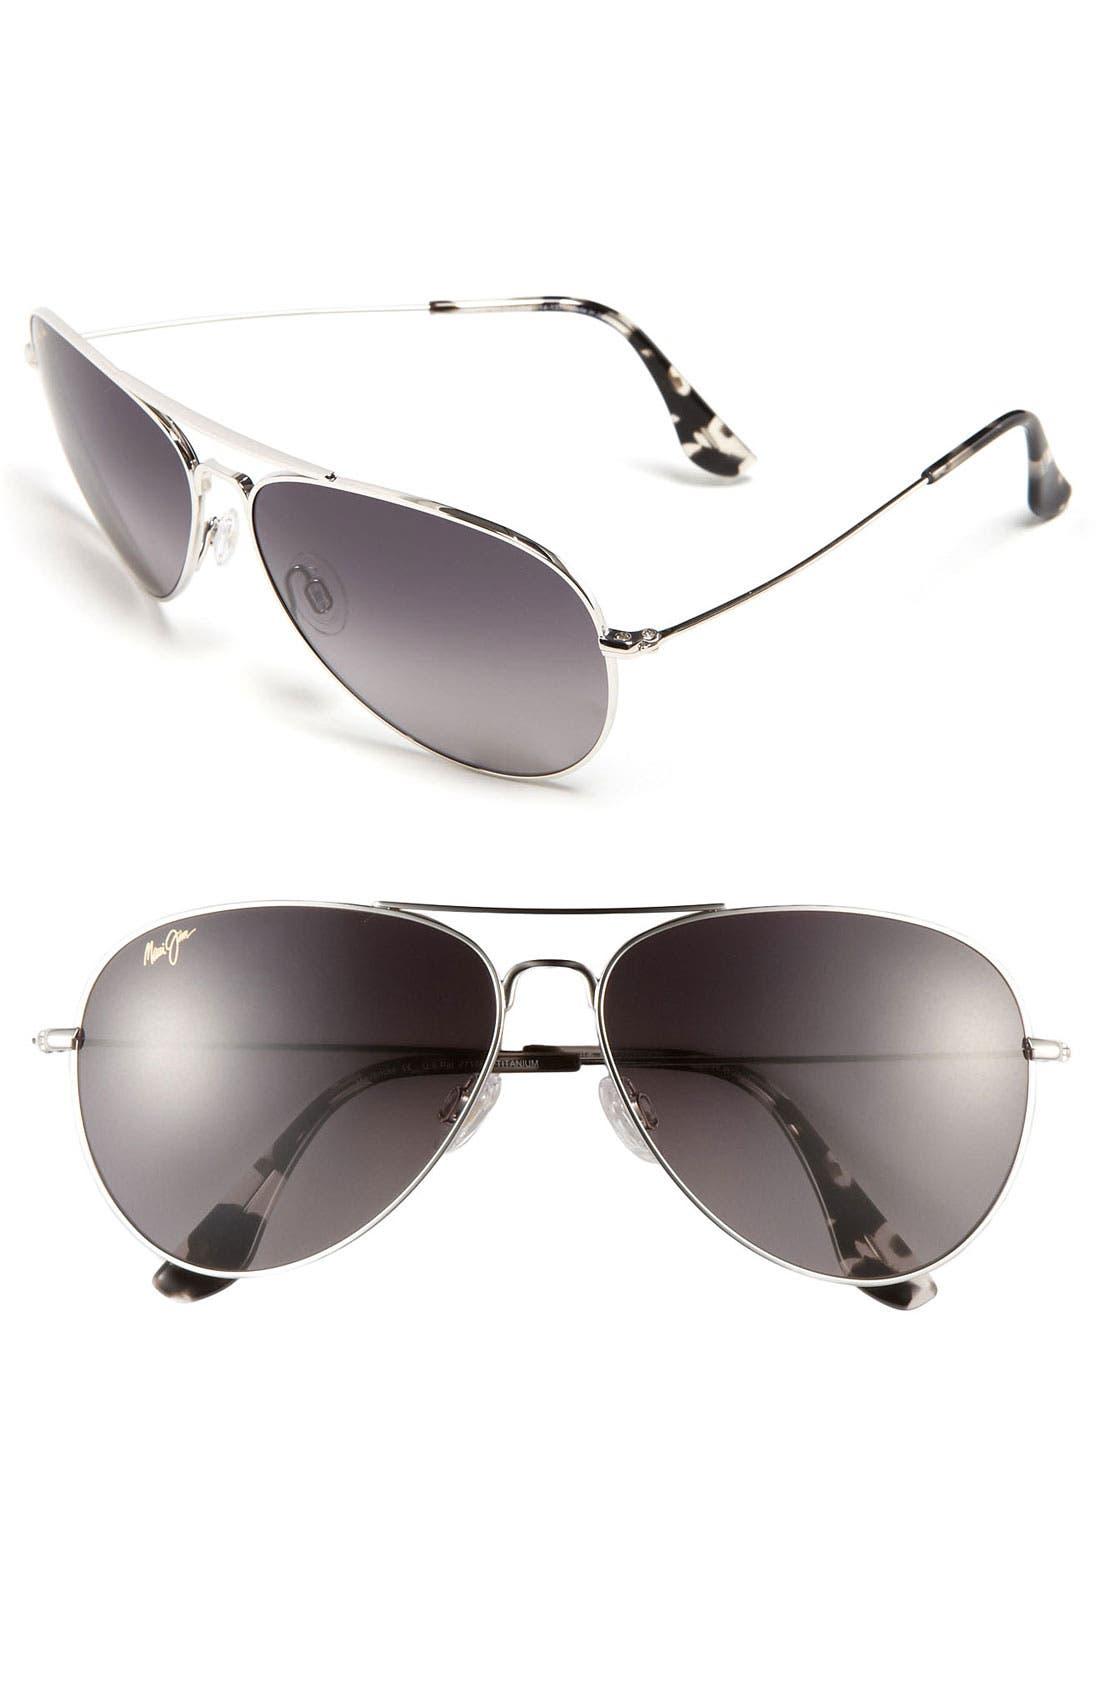 eeb1b1cdaa339 Women s Maui Jim Sunglasses